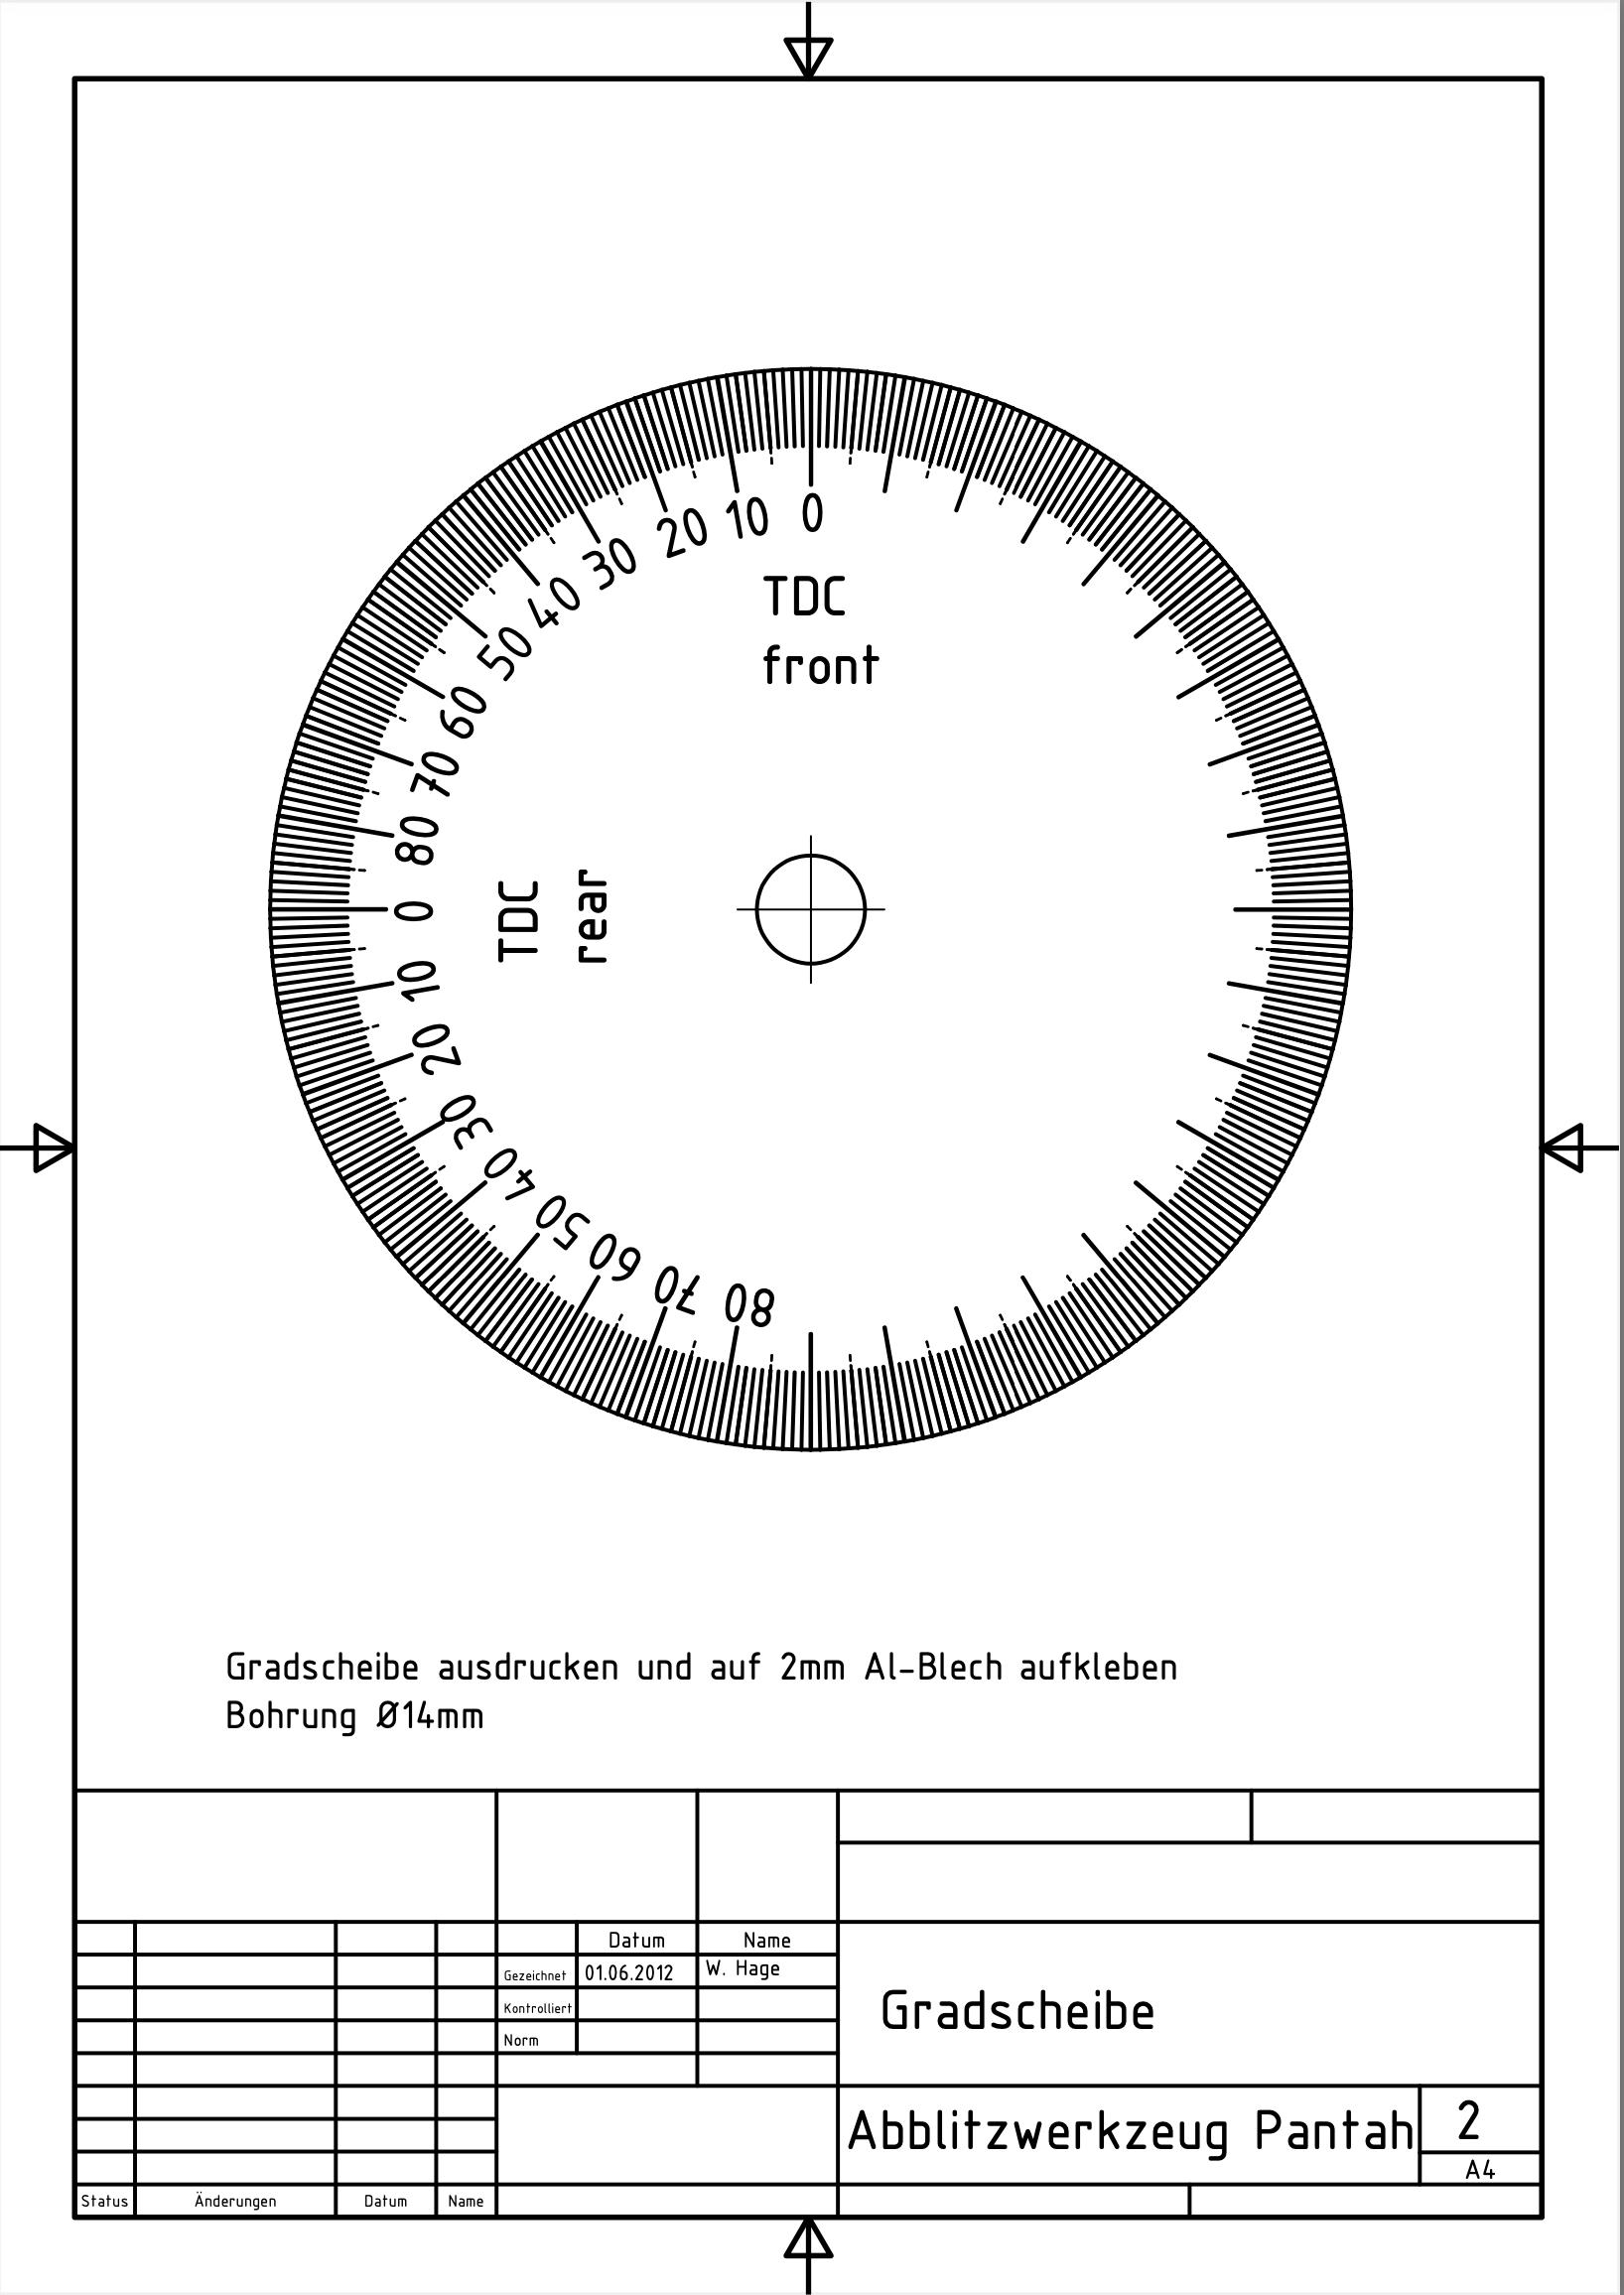 Abblitzwerkzeug Pantah 2